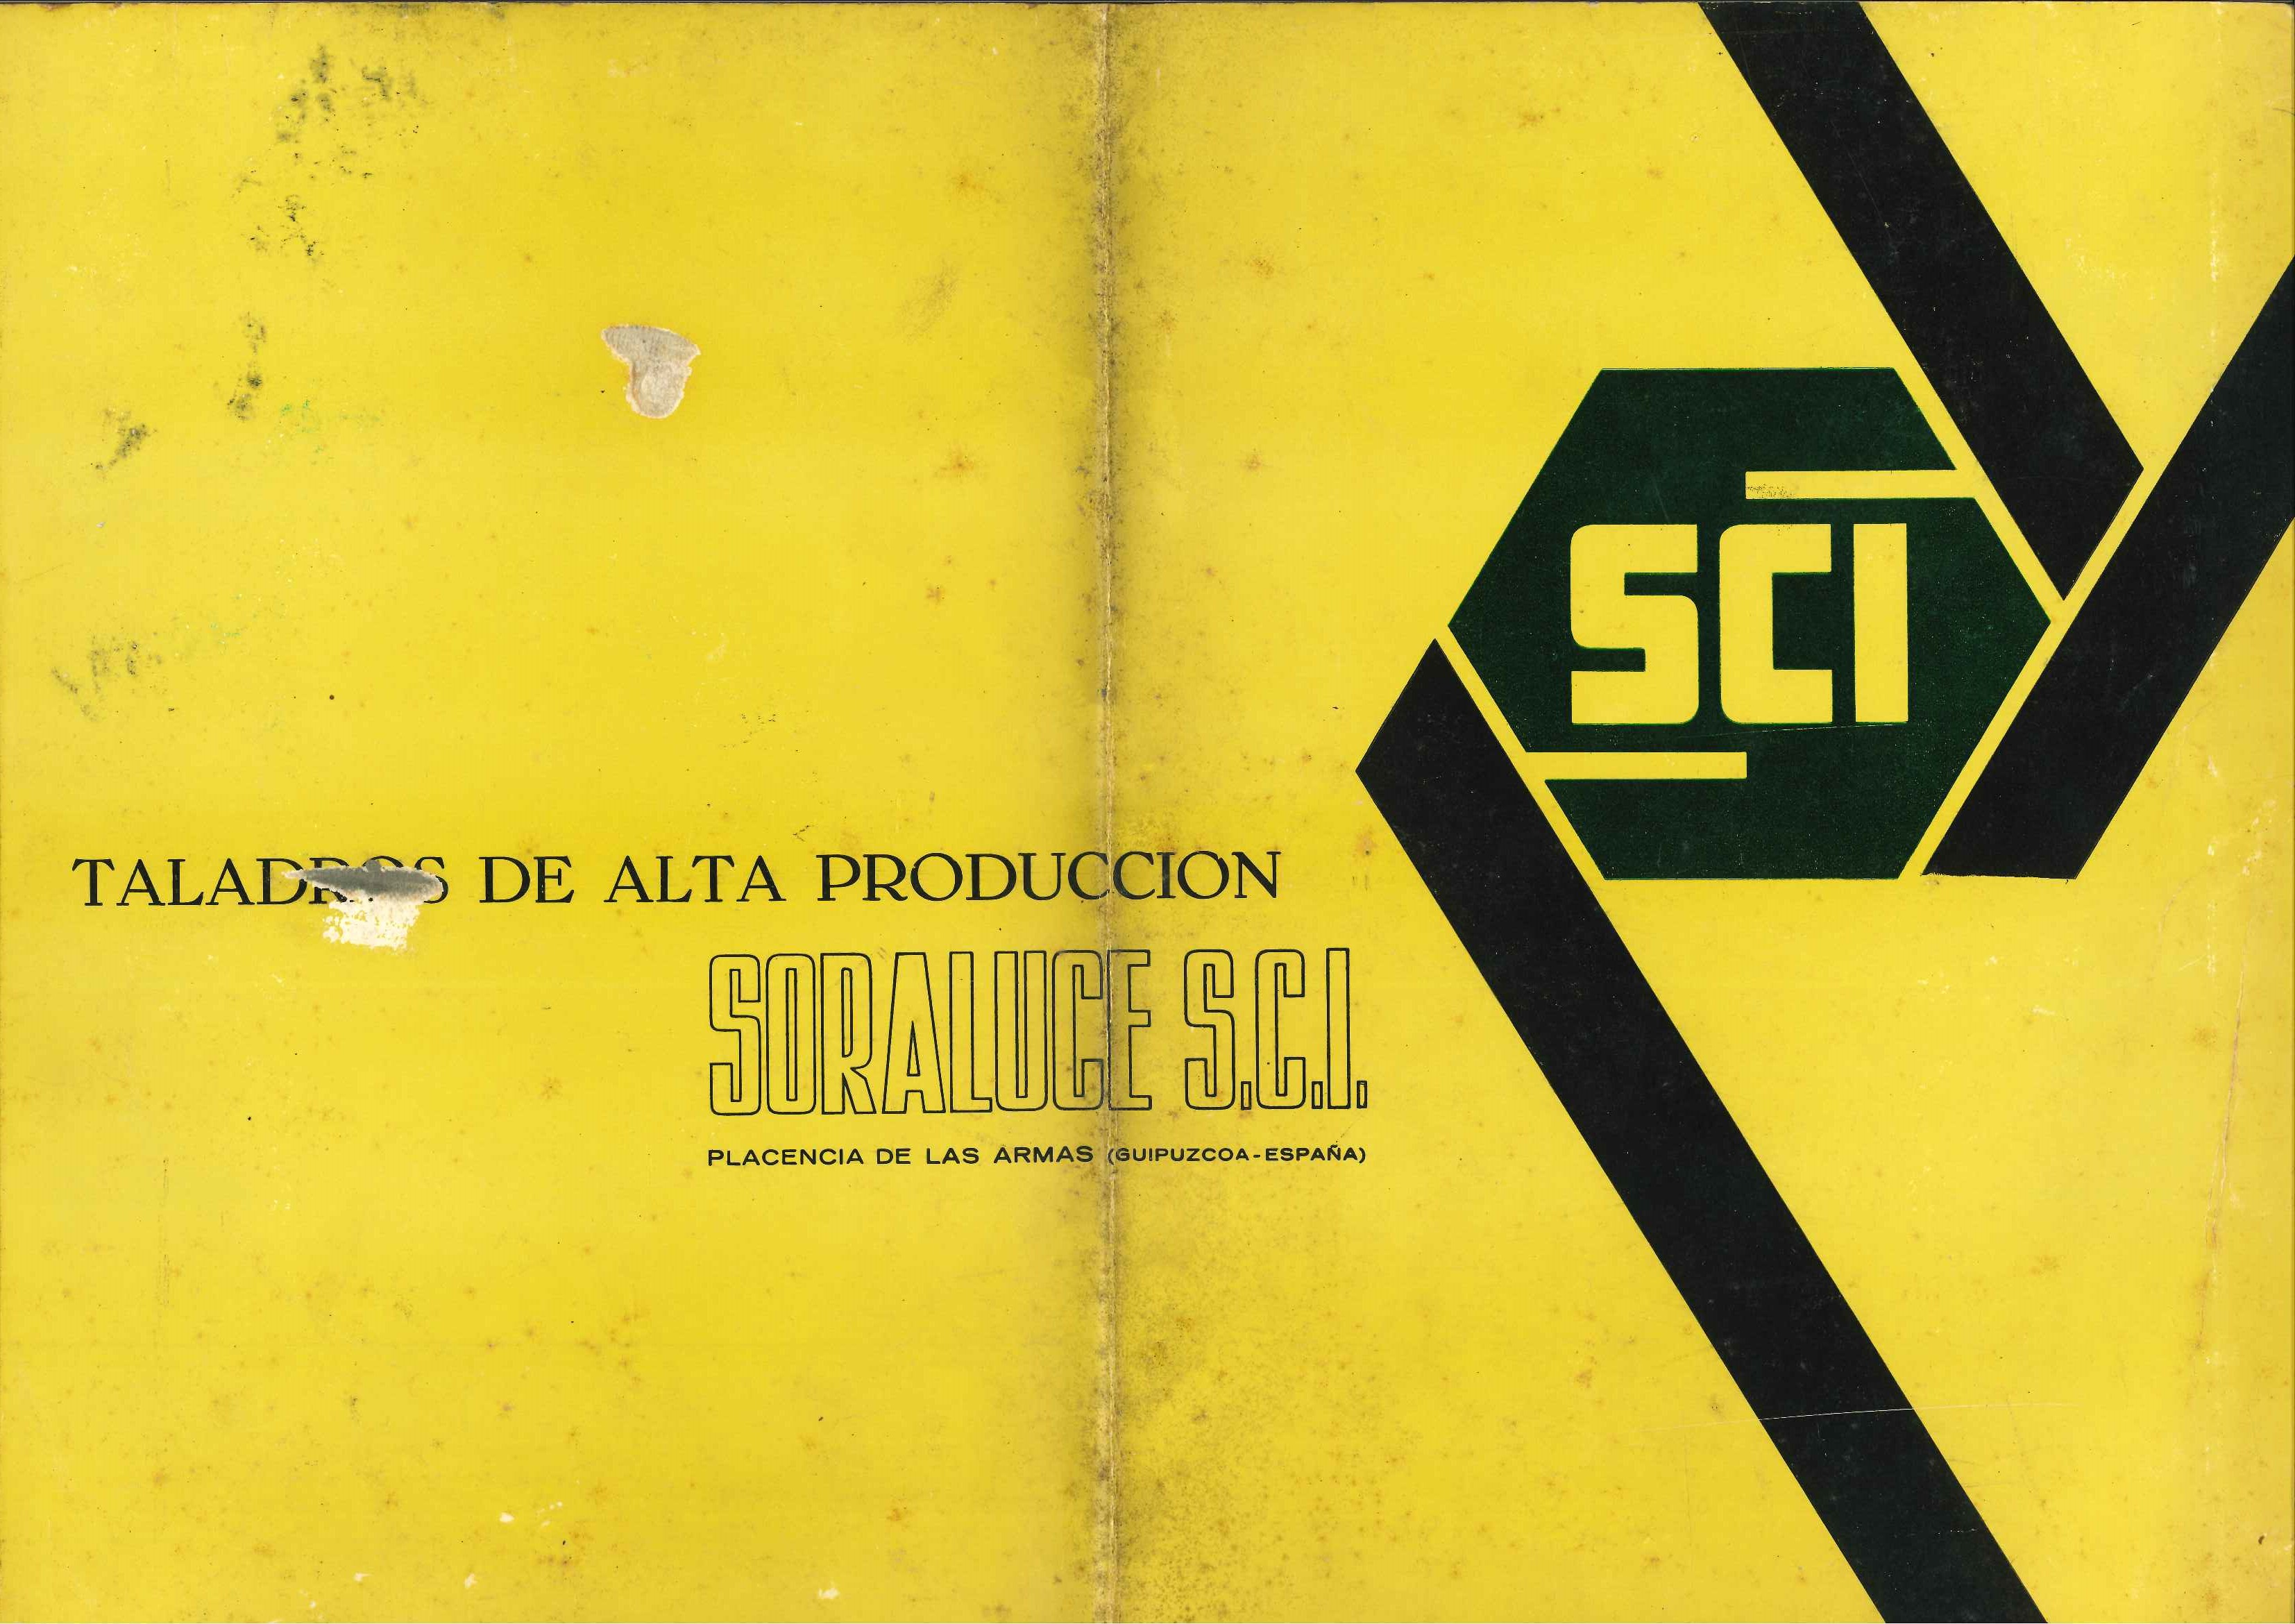 Manual de instrucciones de taladro radial SORALUCE